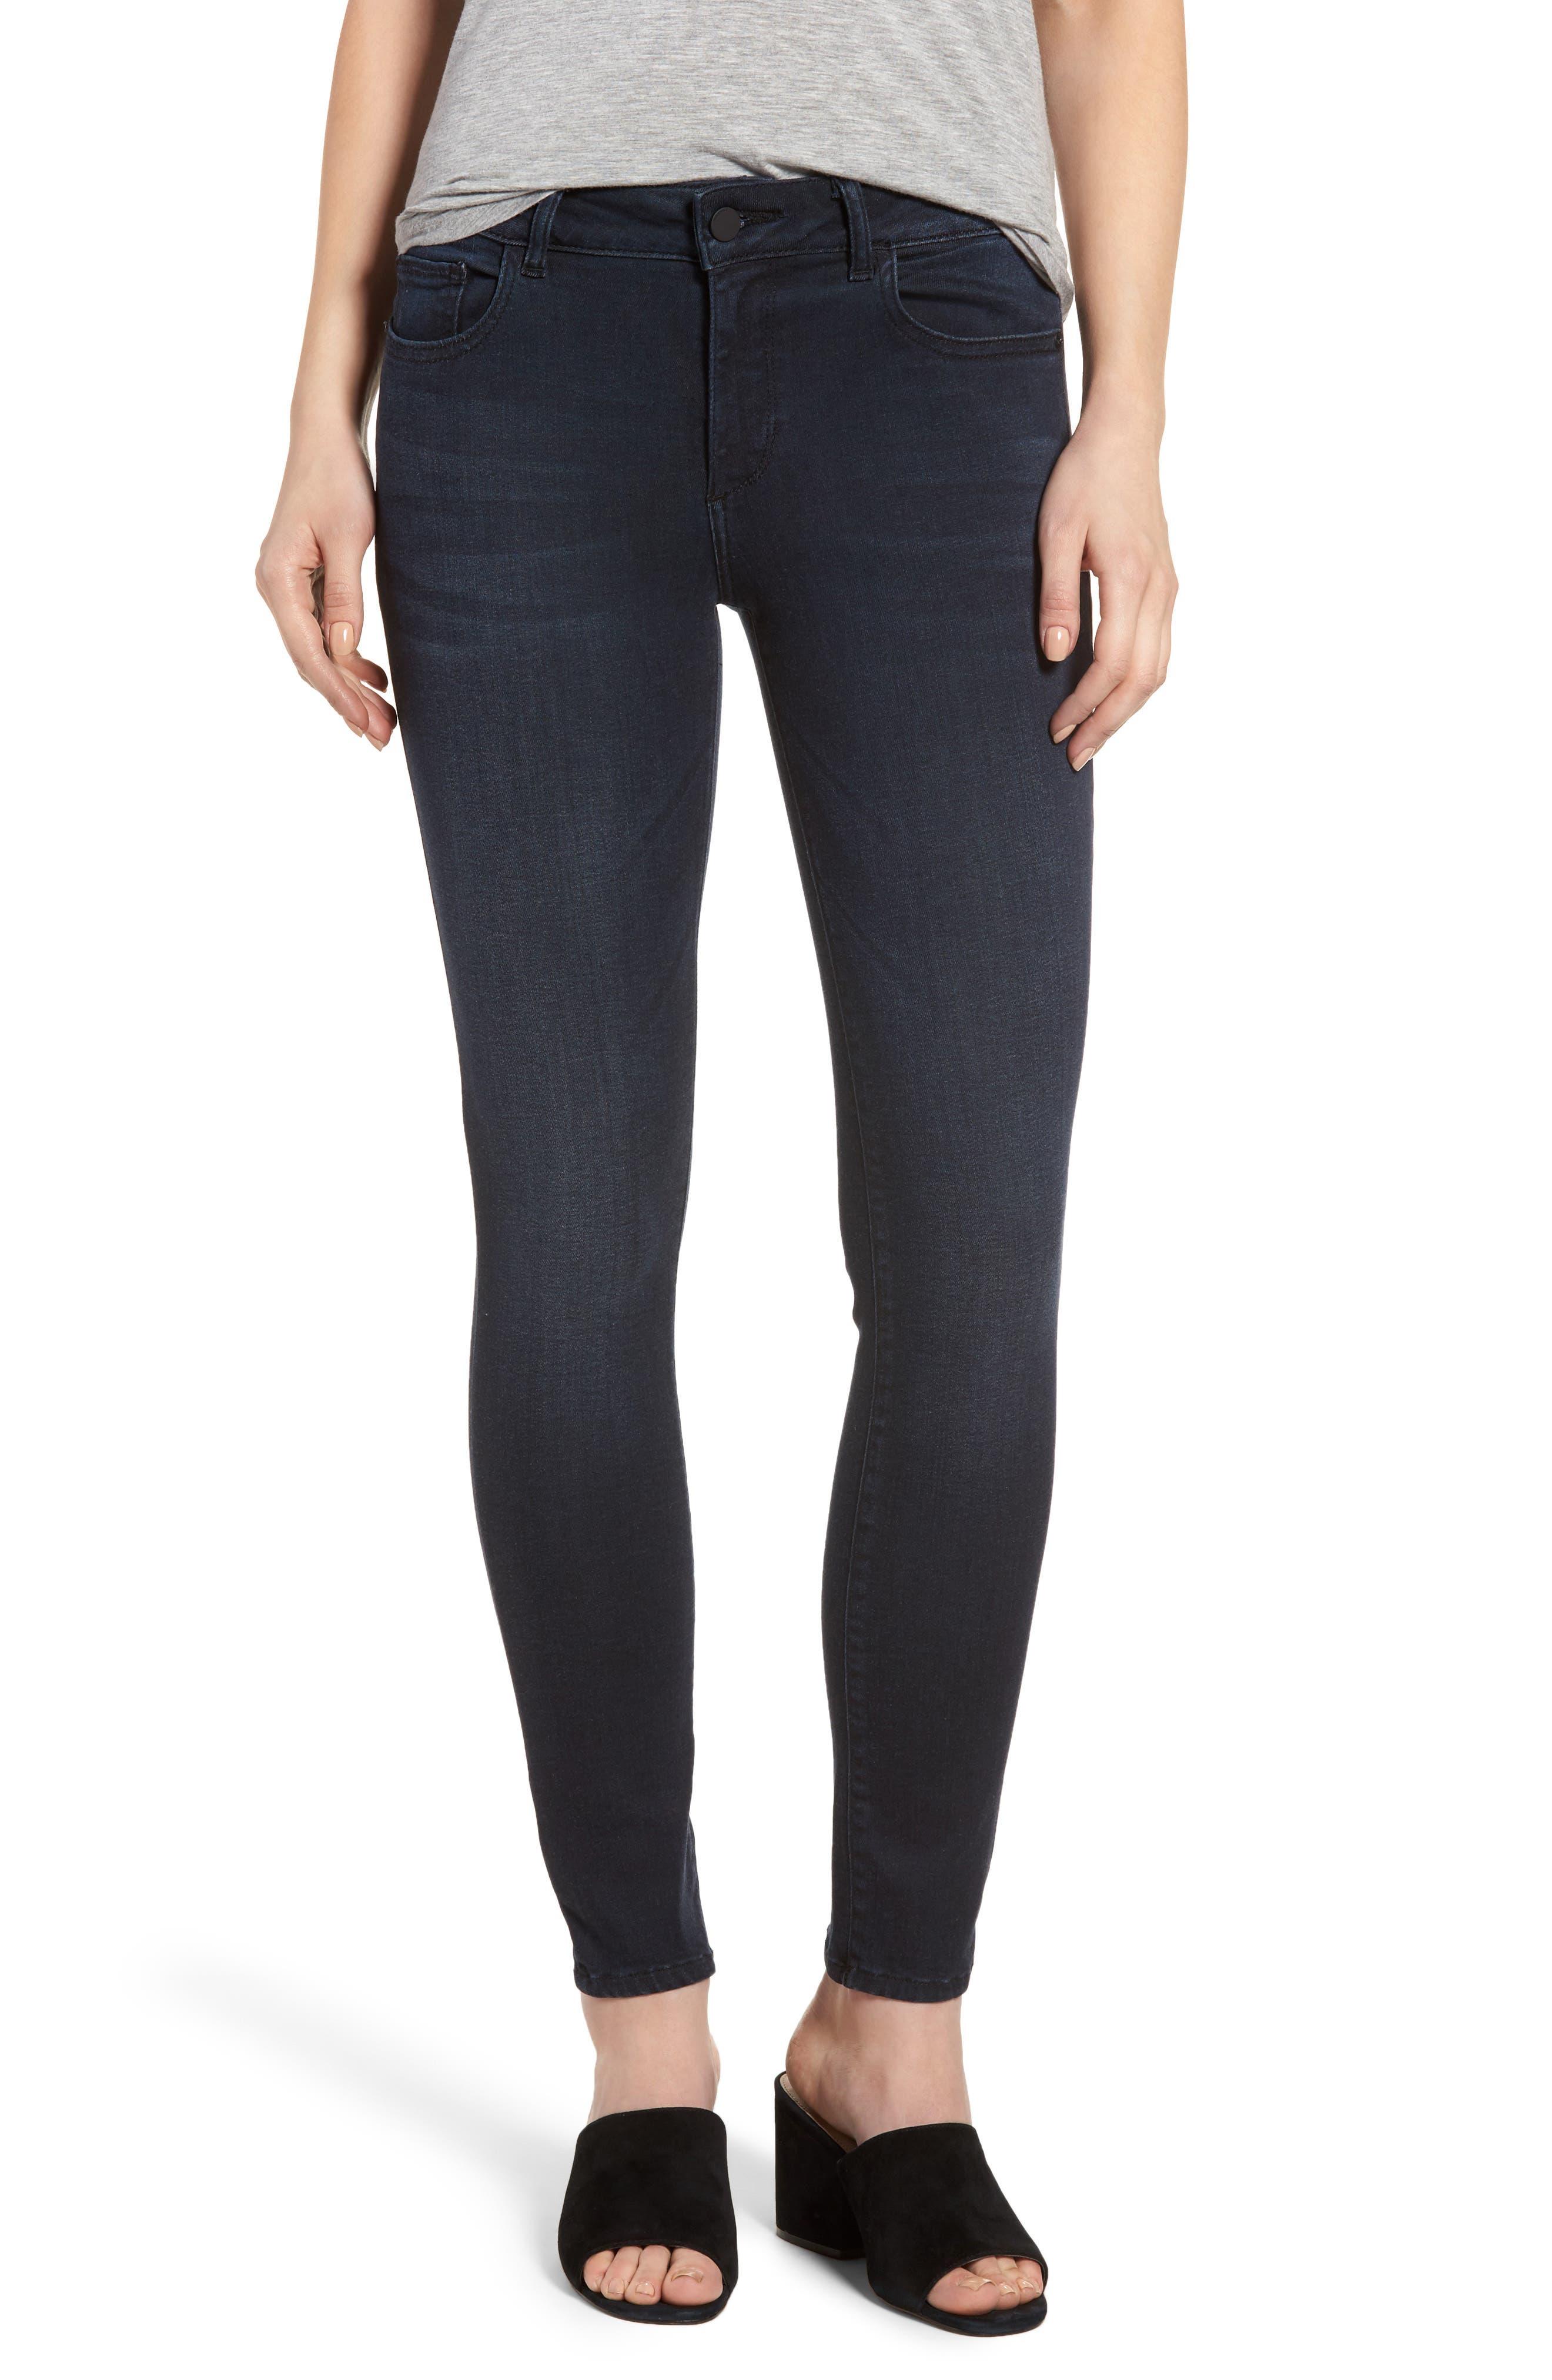 Emma Power Legging Skinny Jeans,                         Main,                         color, Macon